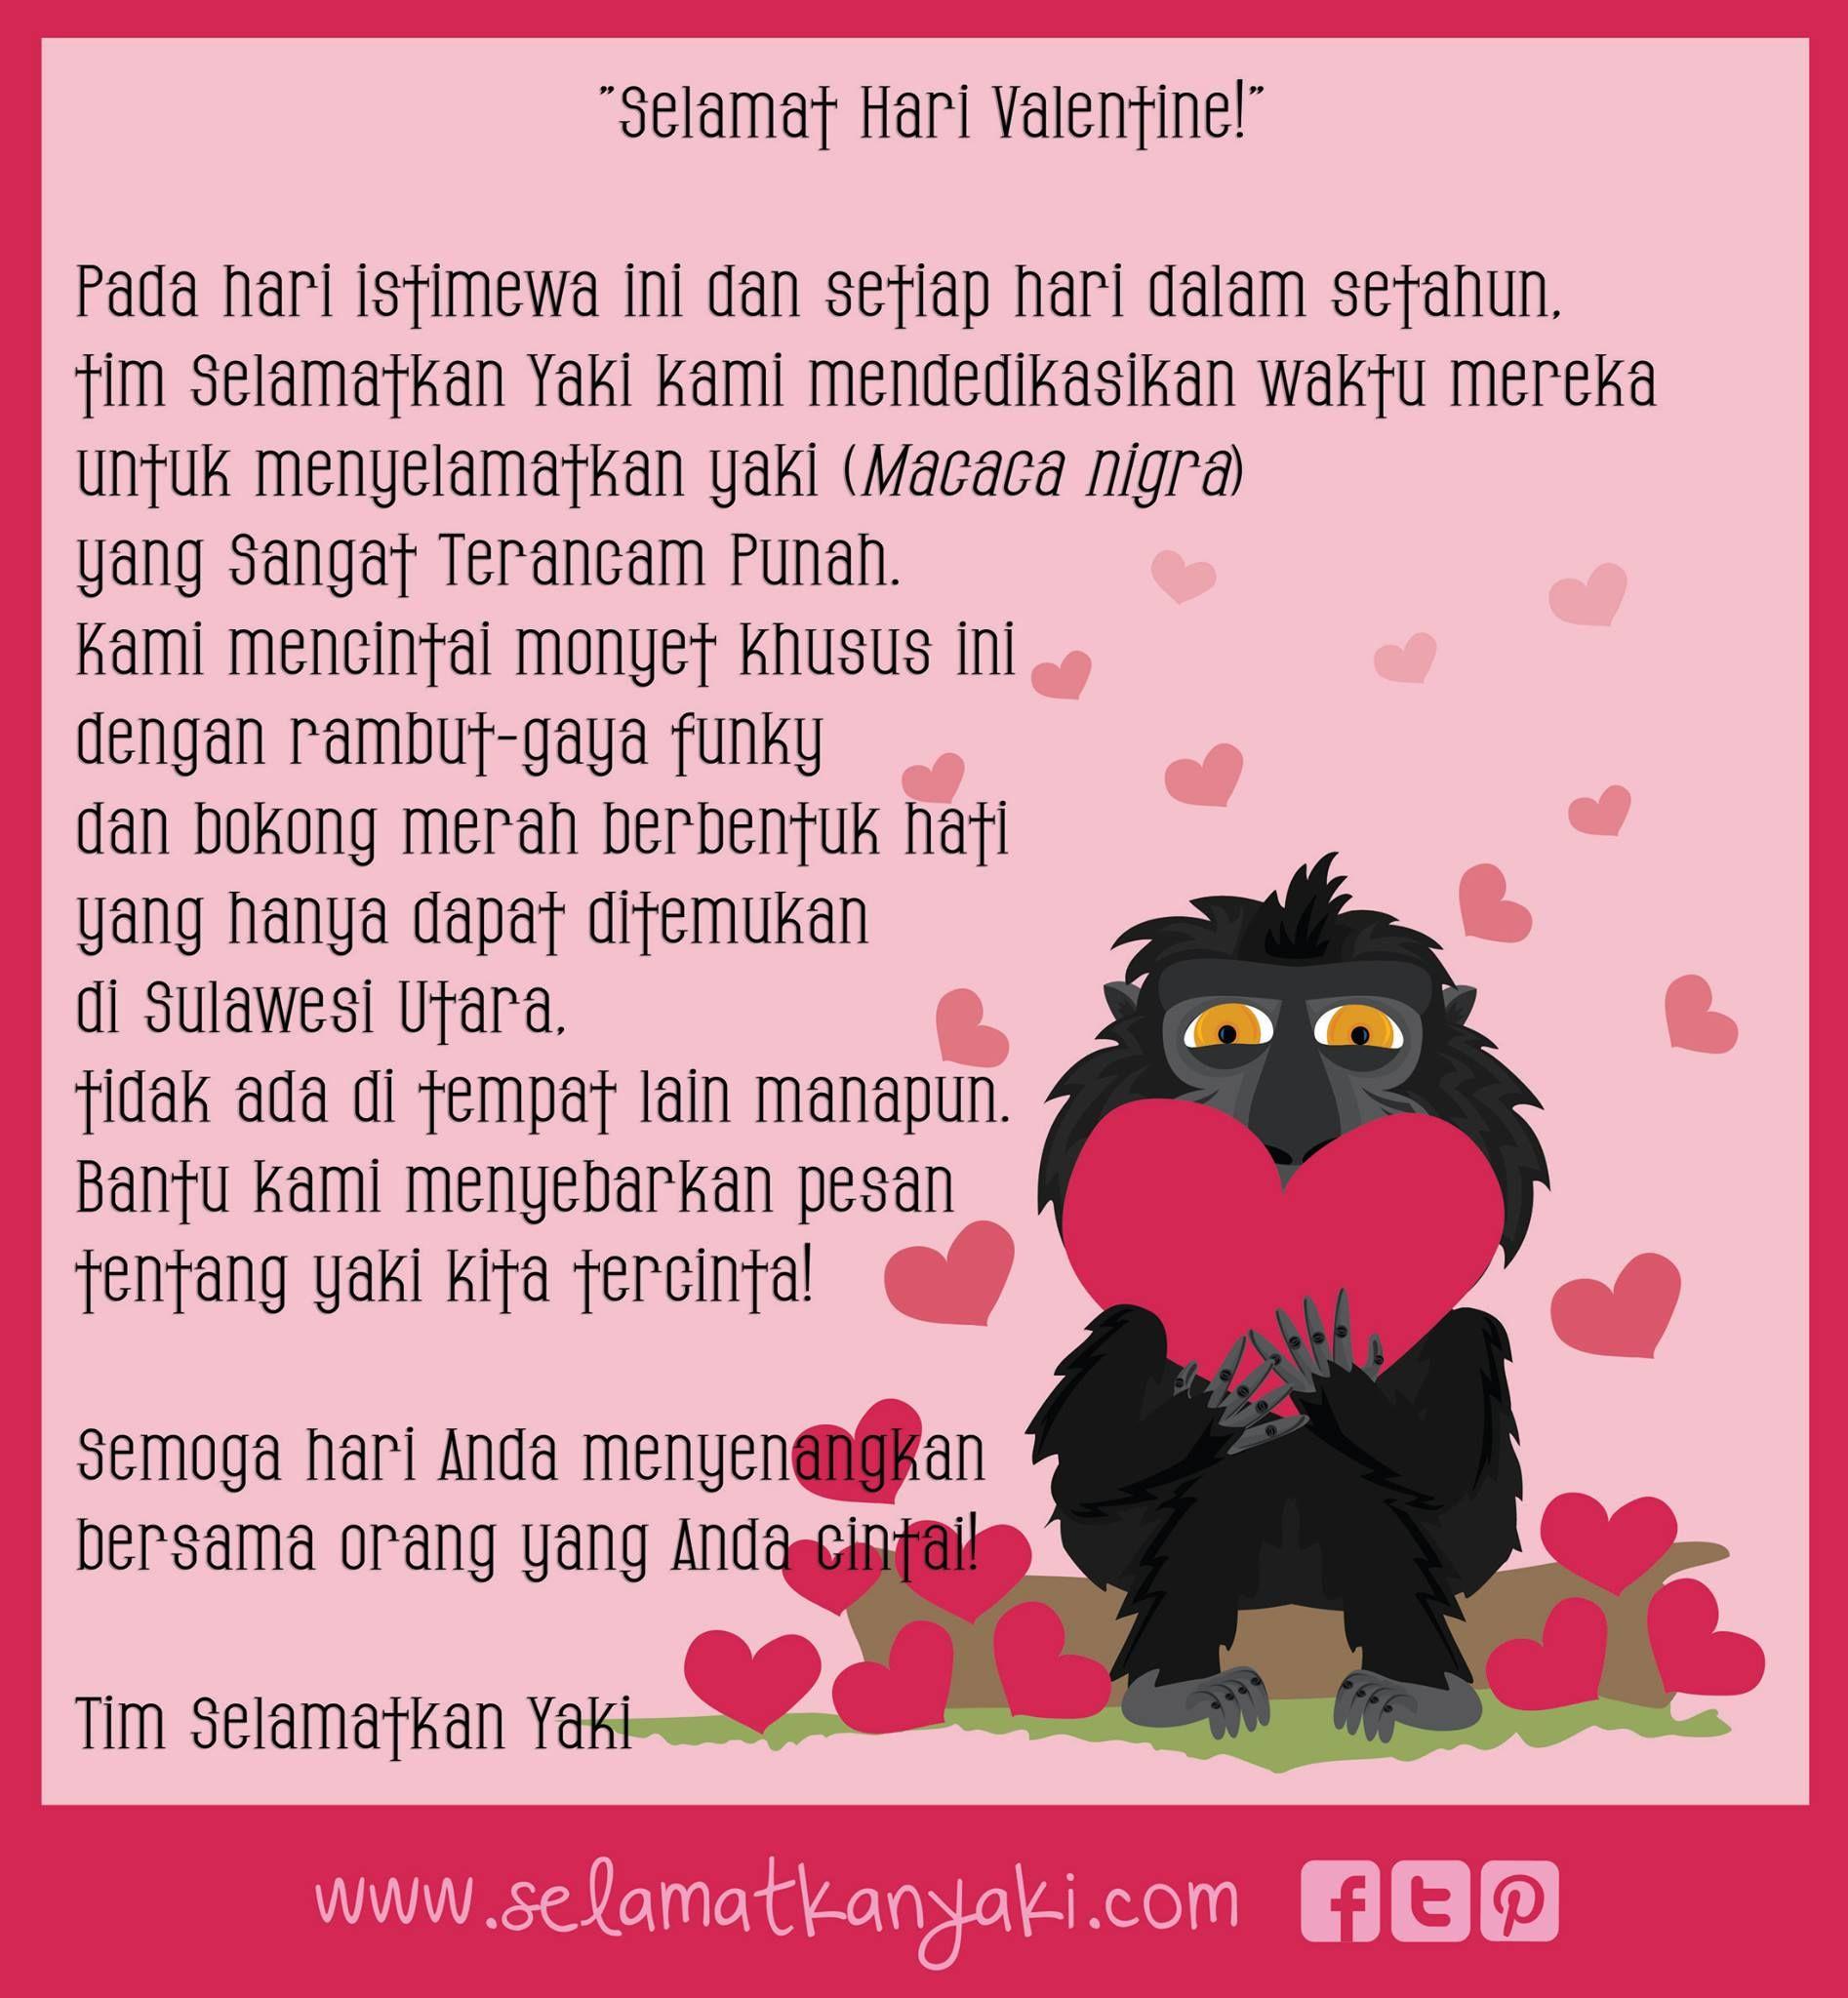 Happy Valentine S Day From Our Selamatkan Yaki Team Valentine Hari Valentine Bentuk